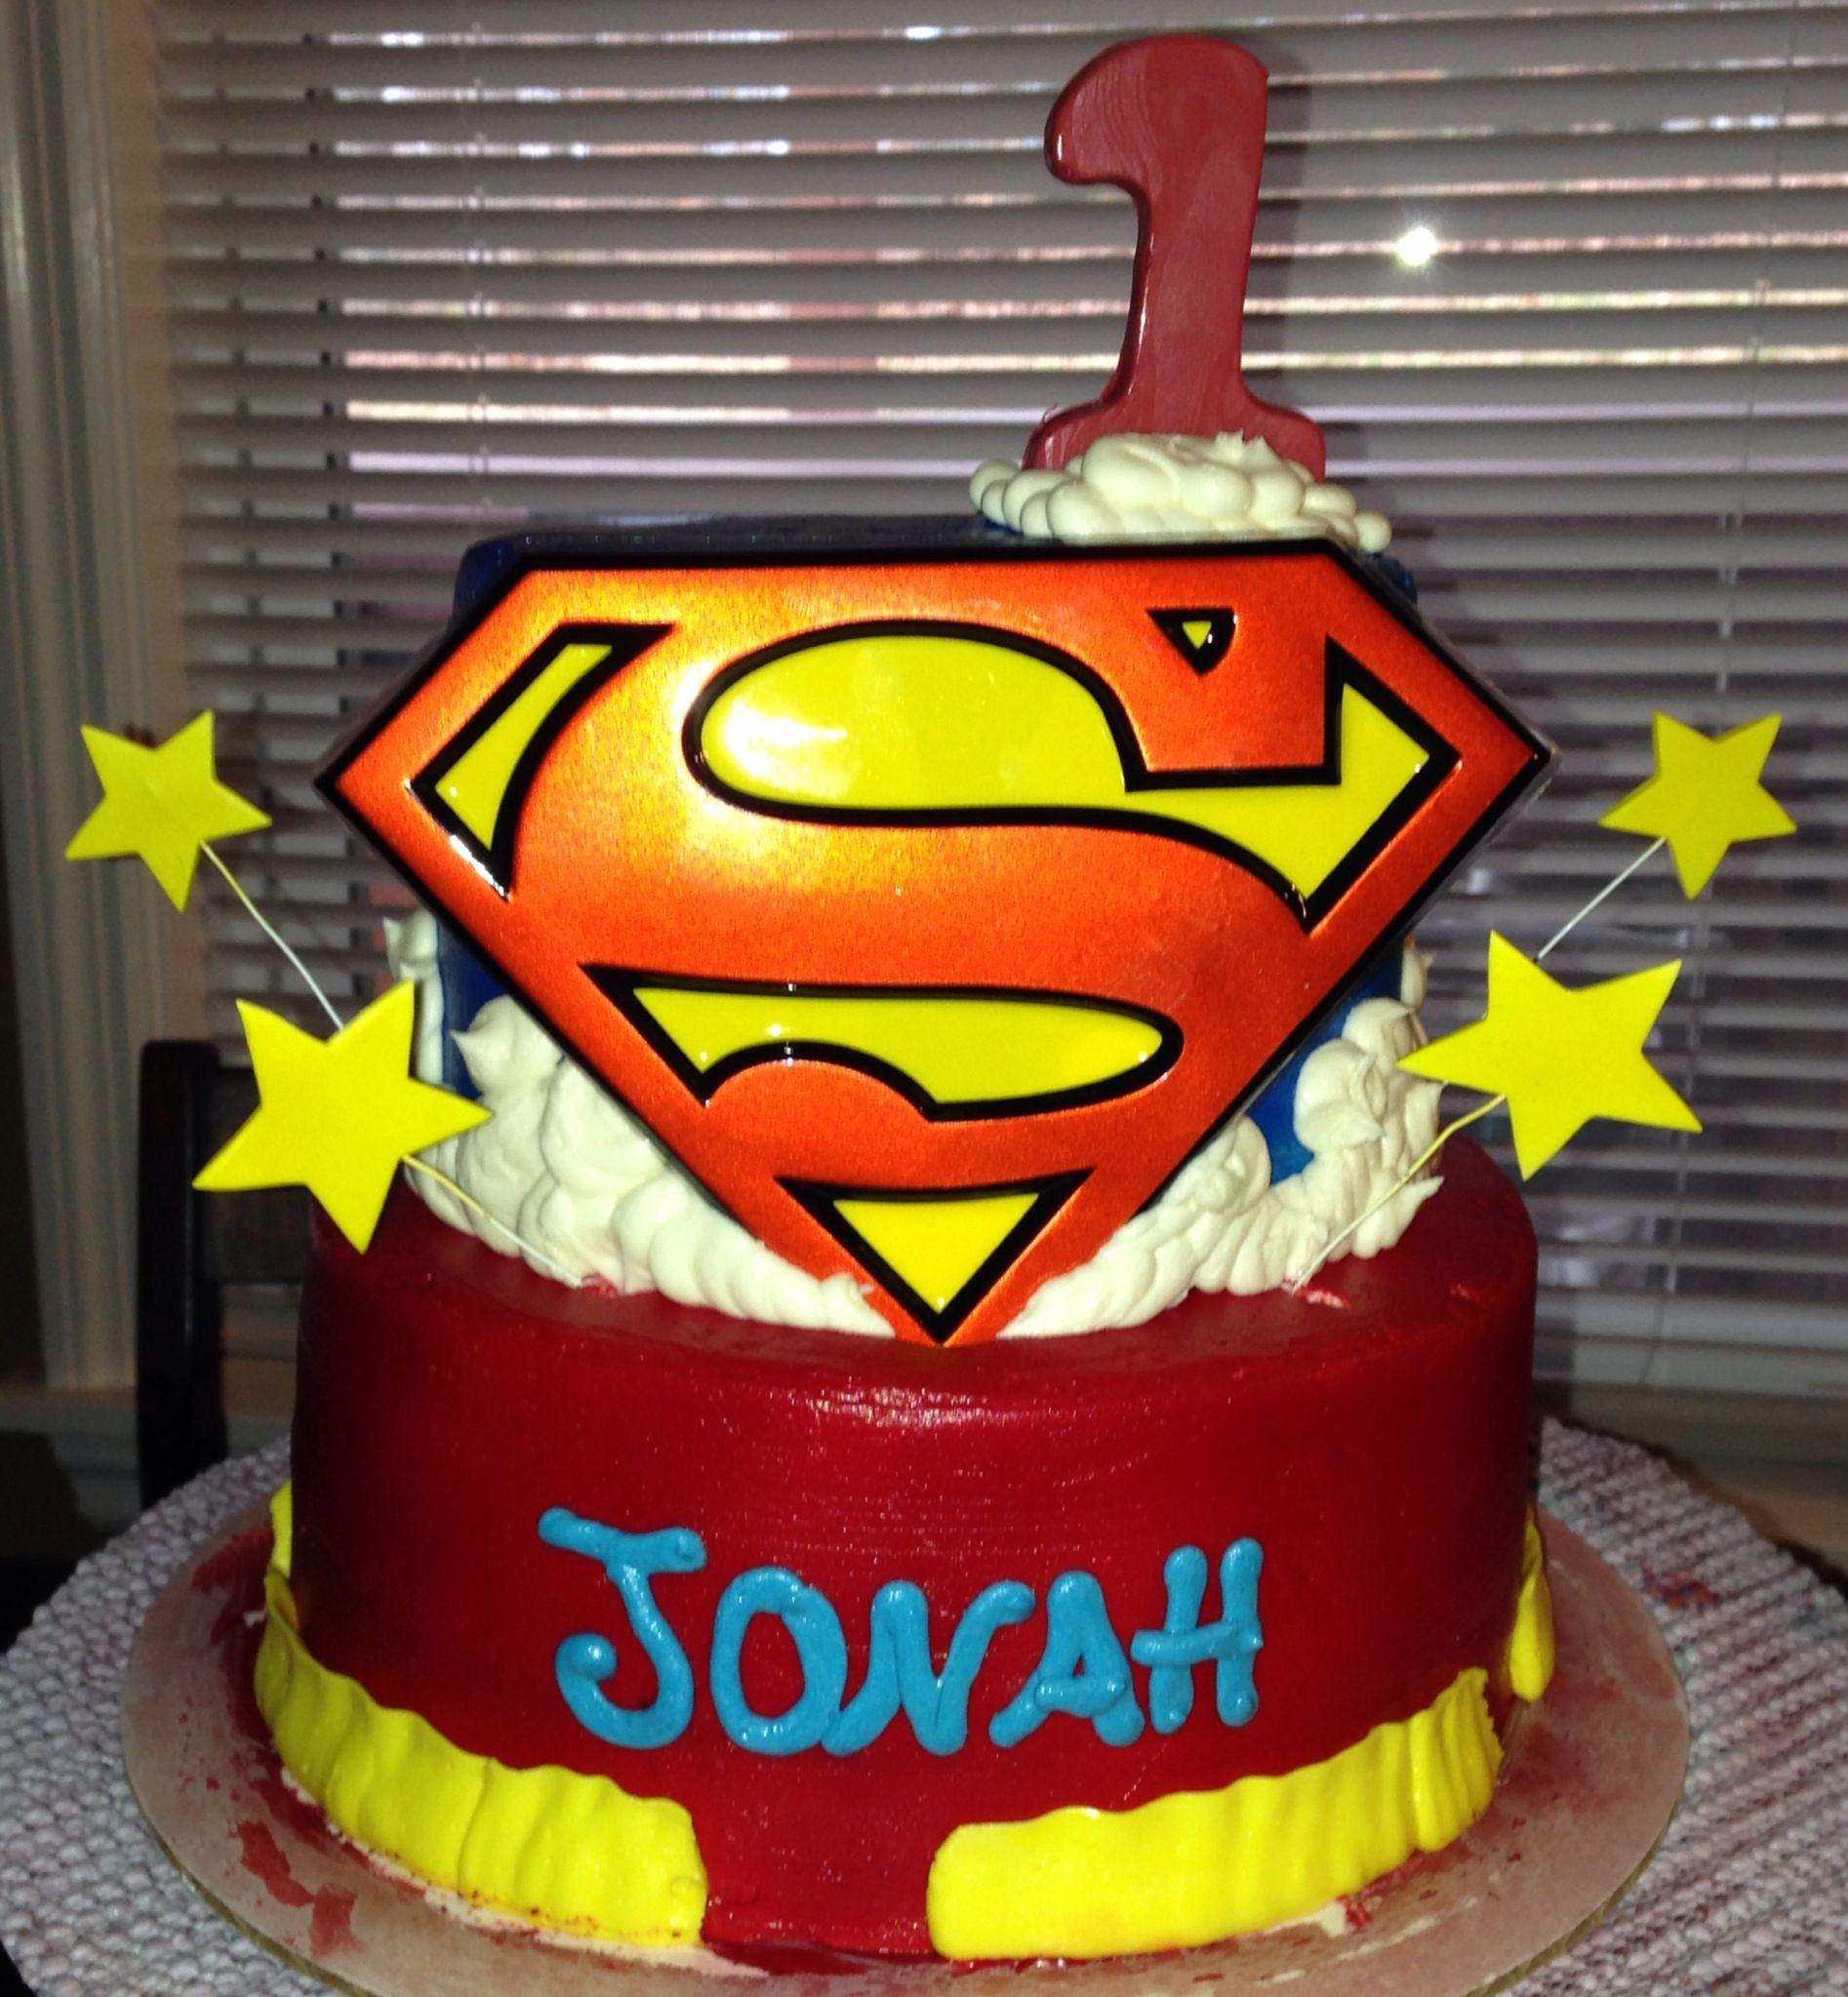 2 Tier Superman First Birthday Cake